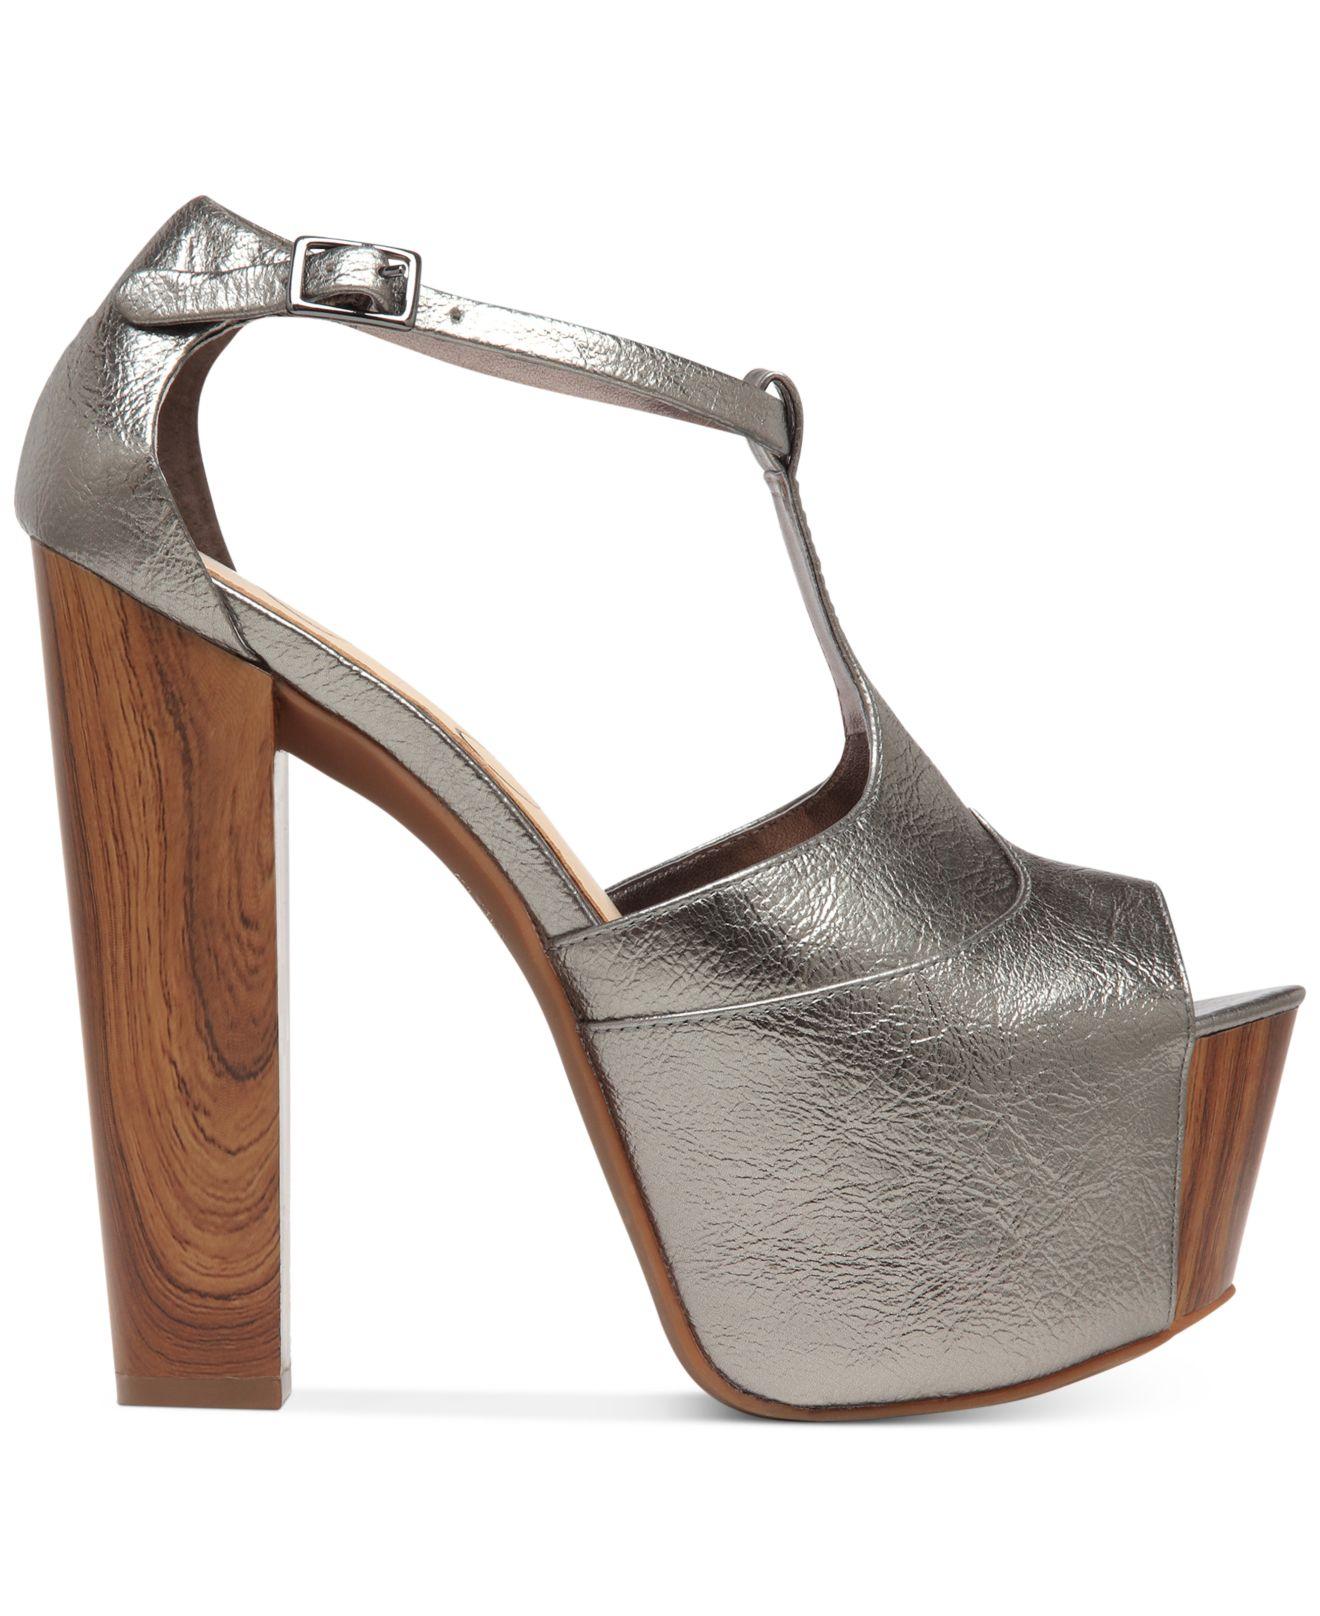 3665594c575 Lyst - Jessica Simpson Dany T-Strap Platform Sandals in Metallic